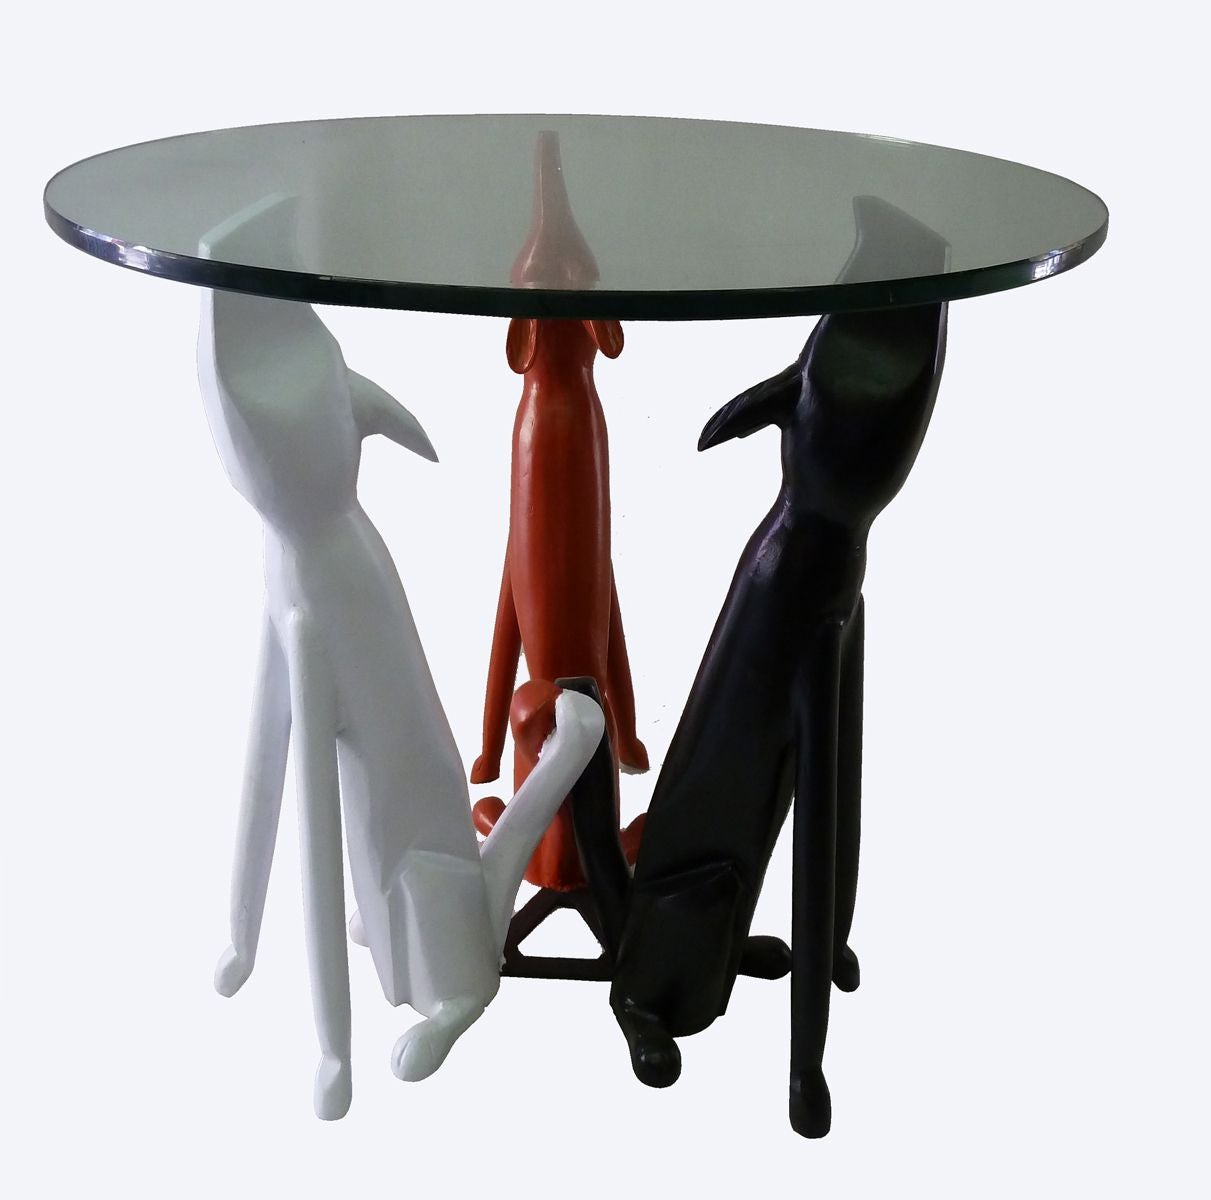 Monteverdi Young Dog Trio Base Table in Aluminum Chairish : 5250ea55 6bfb 4e3c a5bb b2c21b9fb988aspectfitampwidth640ampheight640 from www.chairish.com size 640 x 640 jpeg 28kB